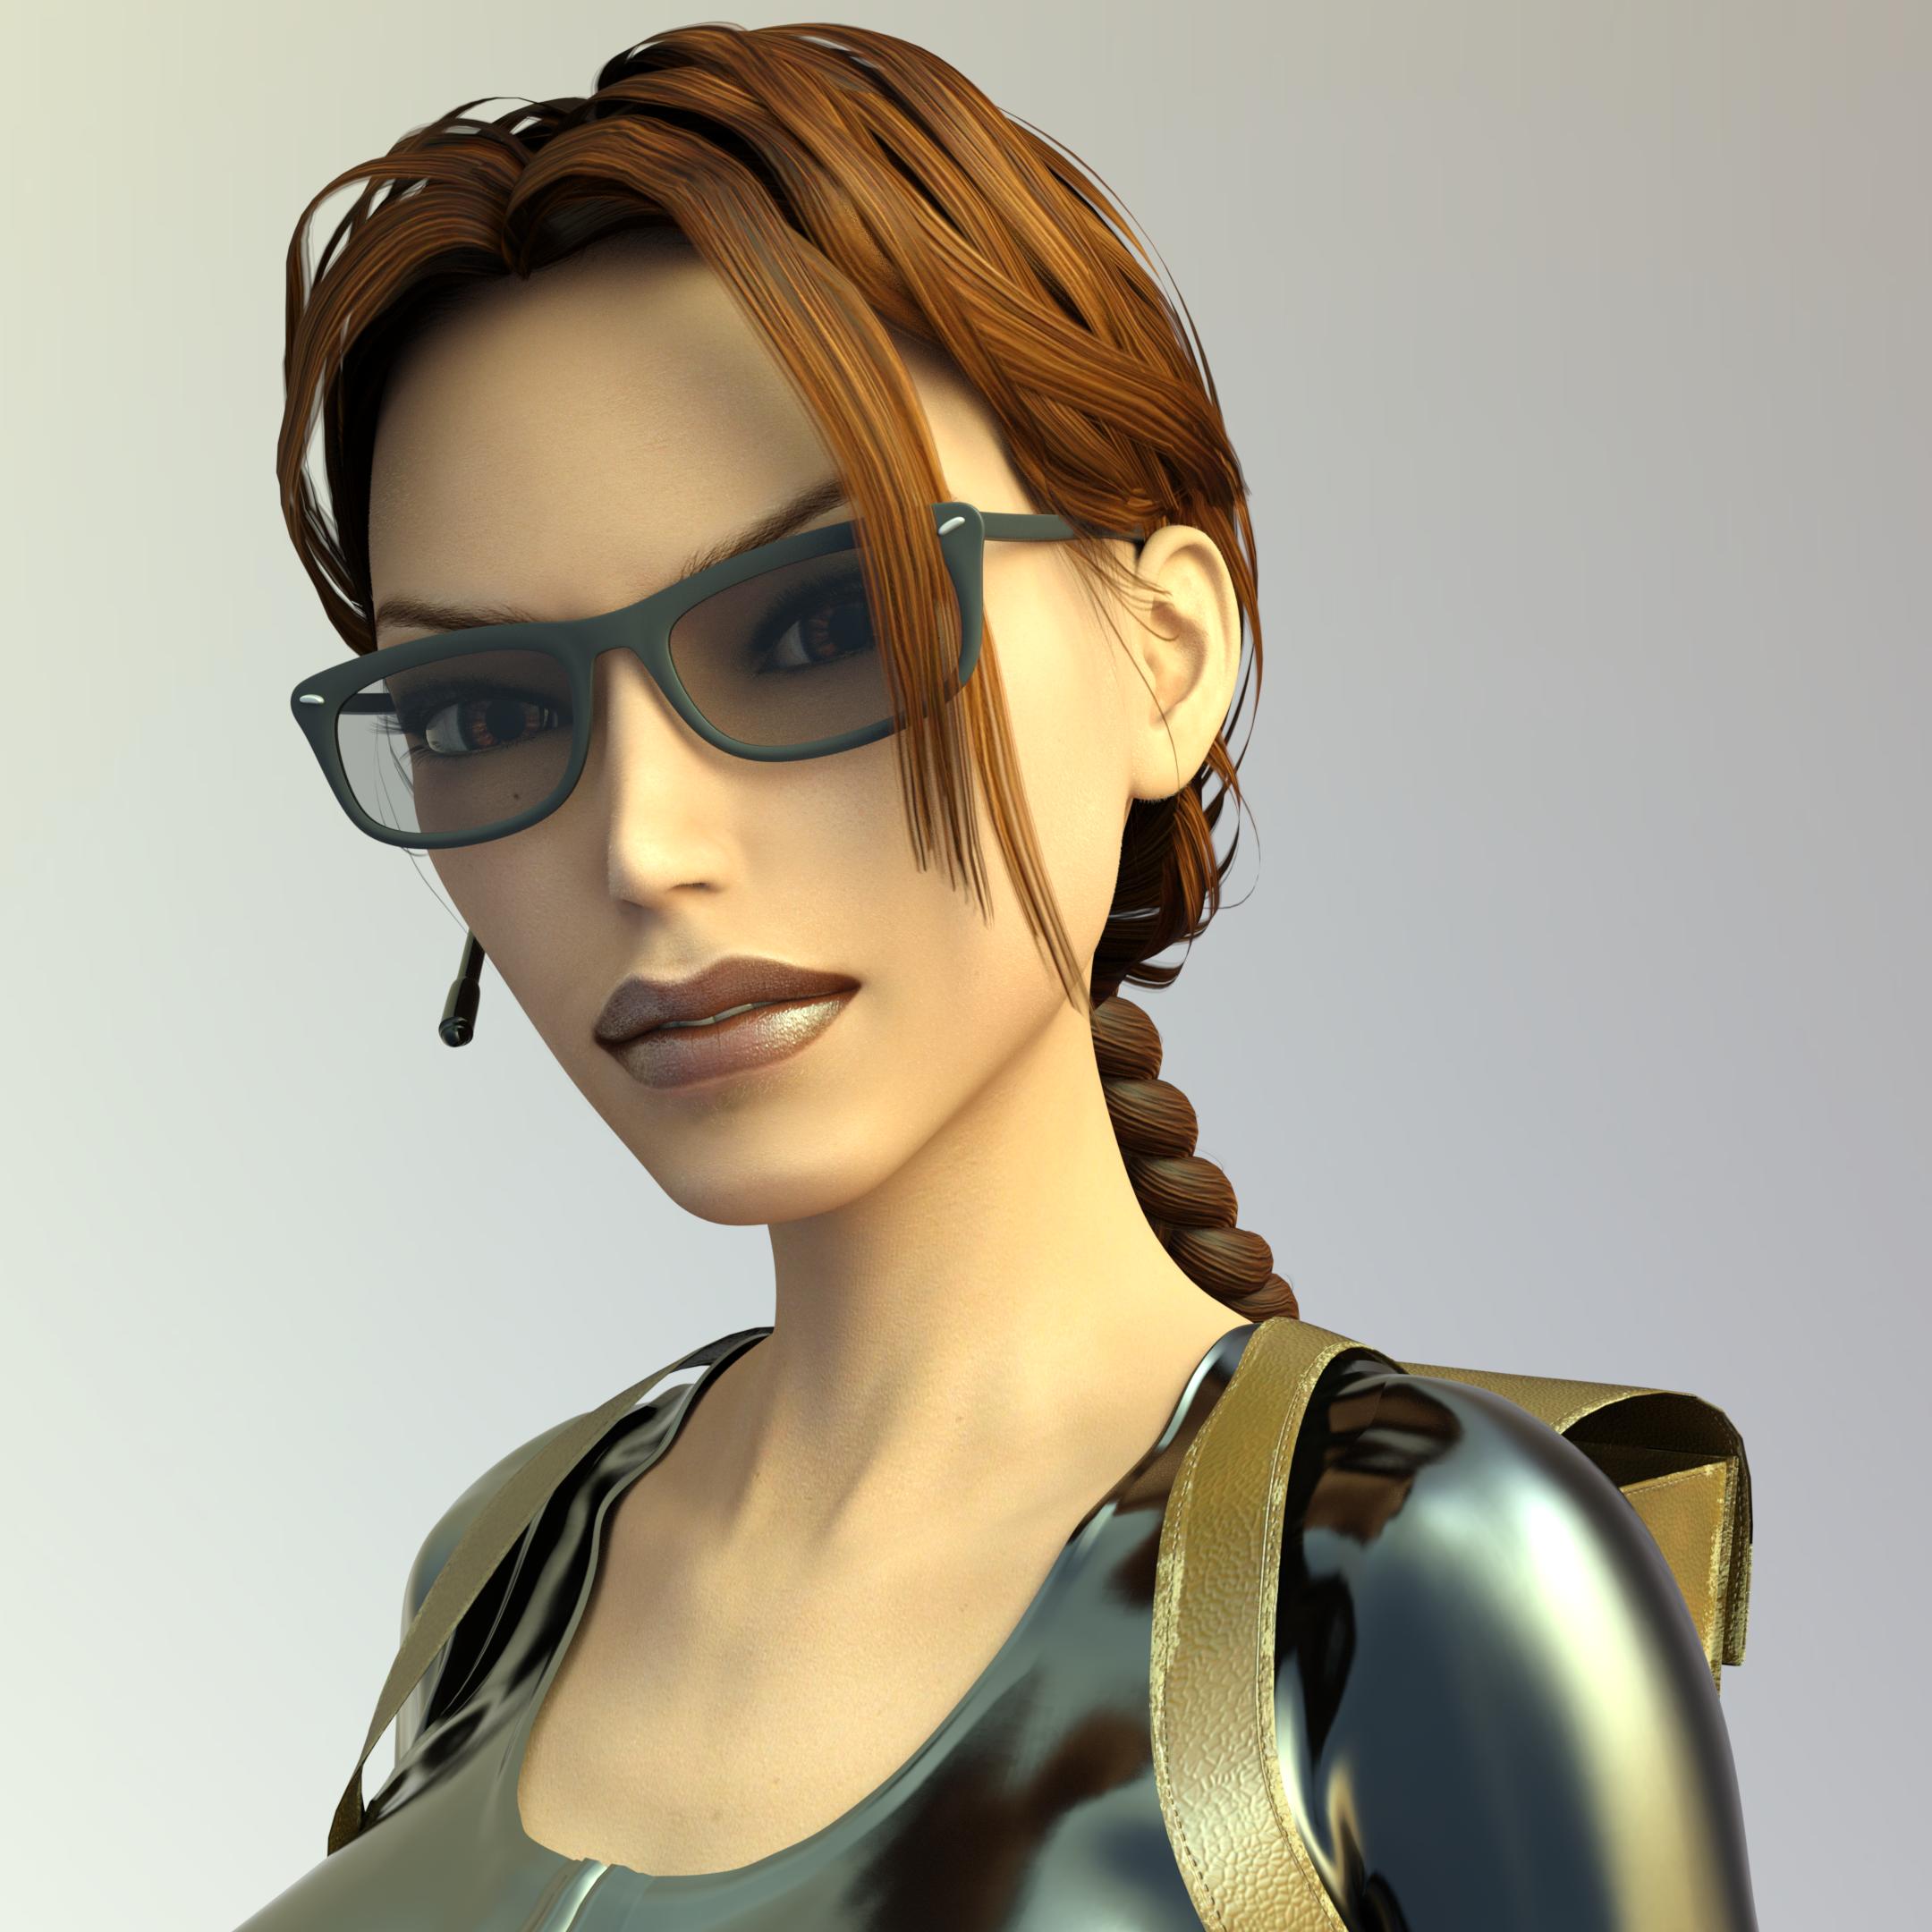 Tomb Rider Wallpaper: Tombraider4evers Fmv Lara Model